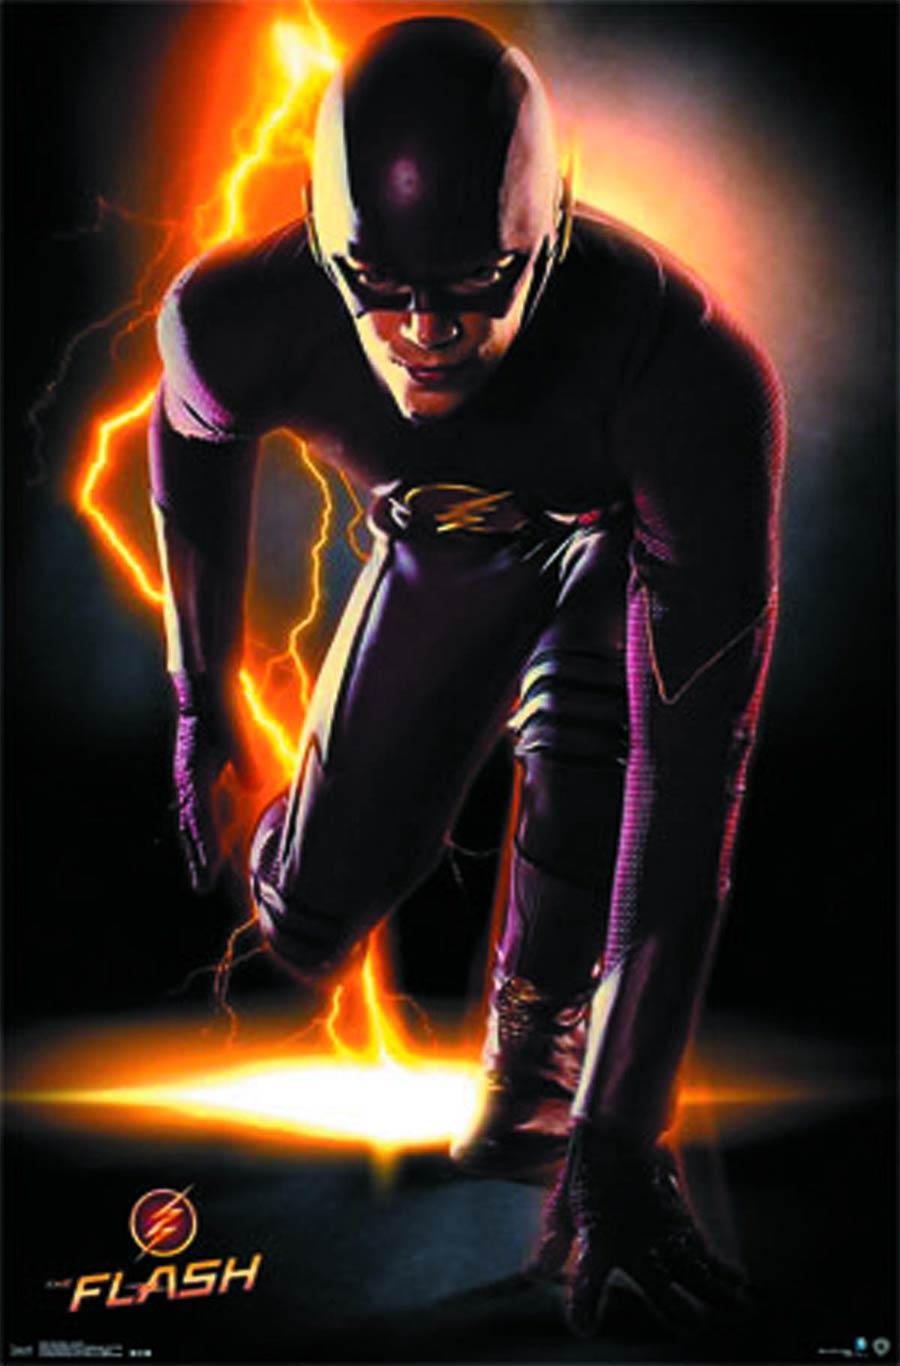 Flash TV 22x52 Poster